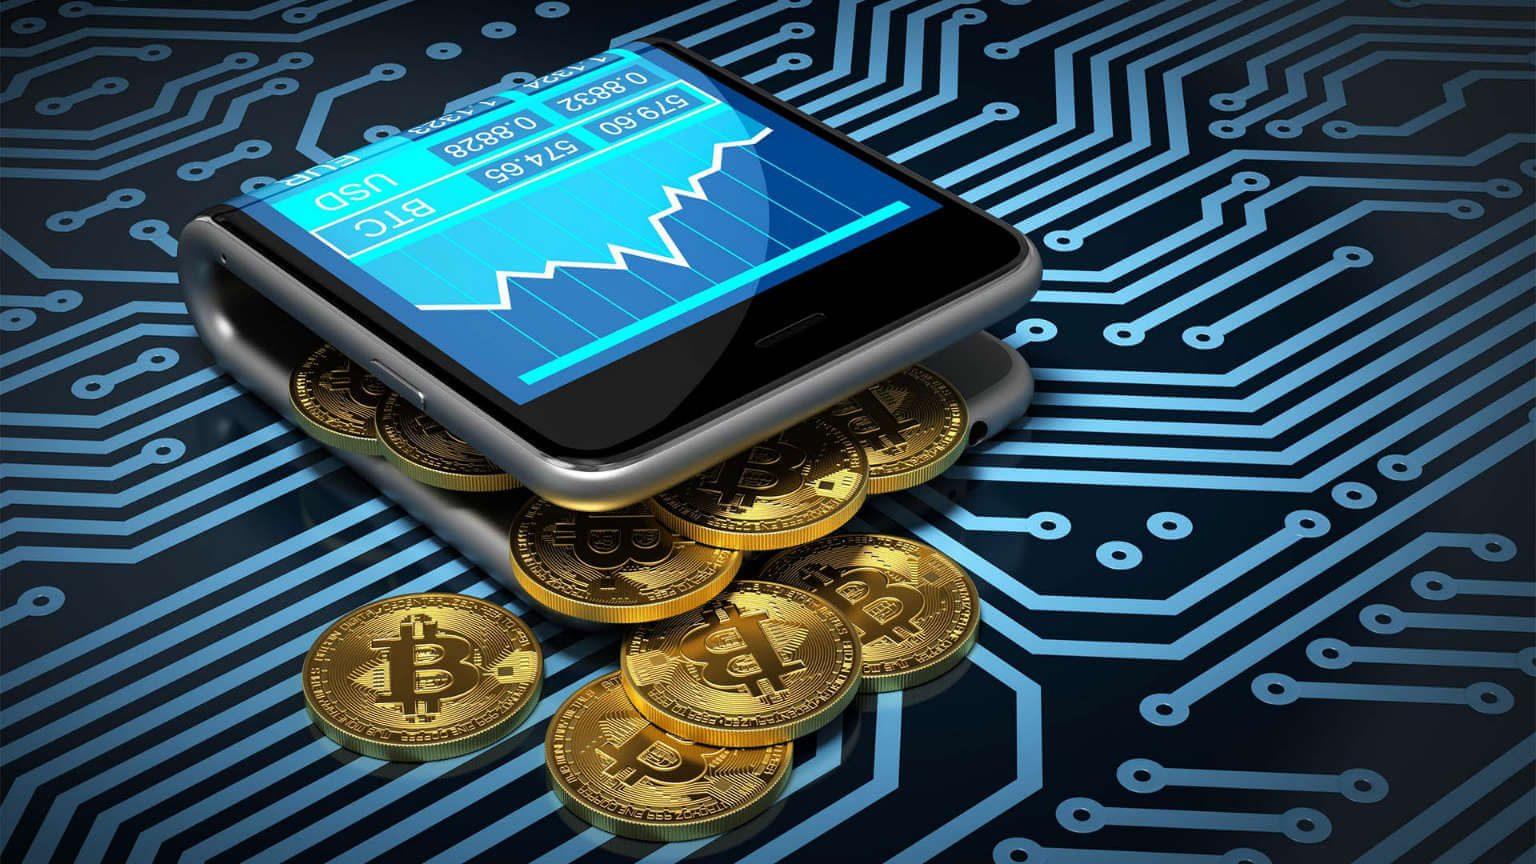 wallet cellphone containing bitcoins